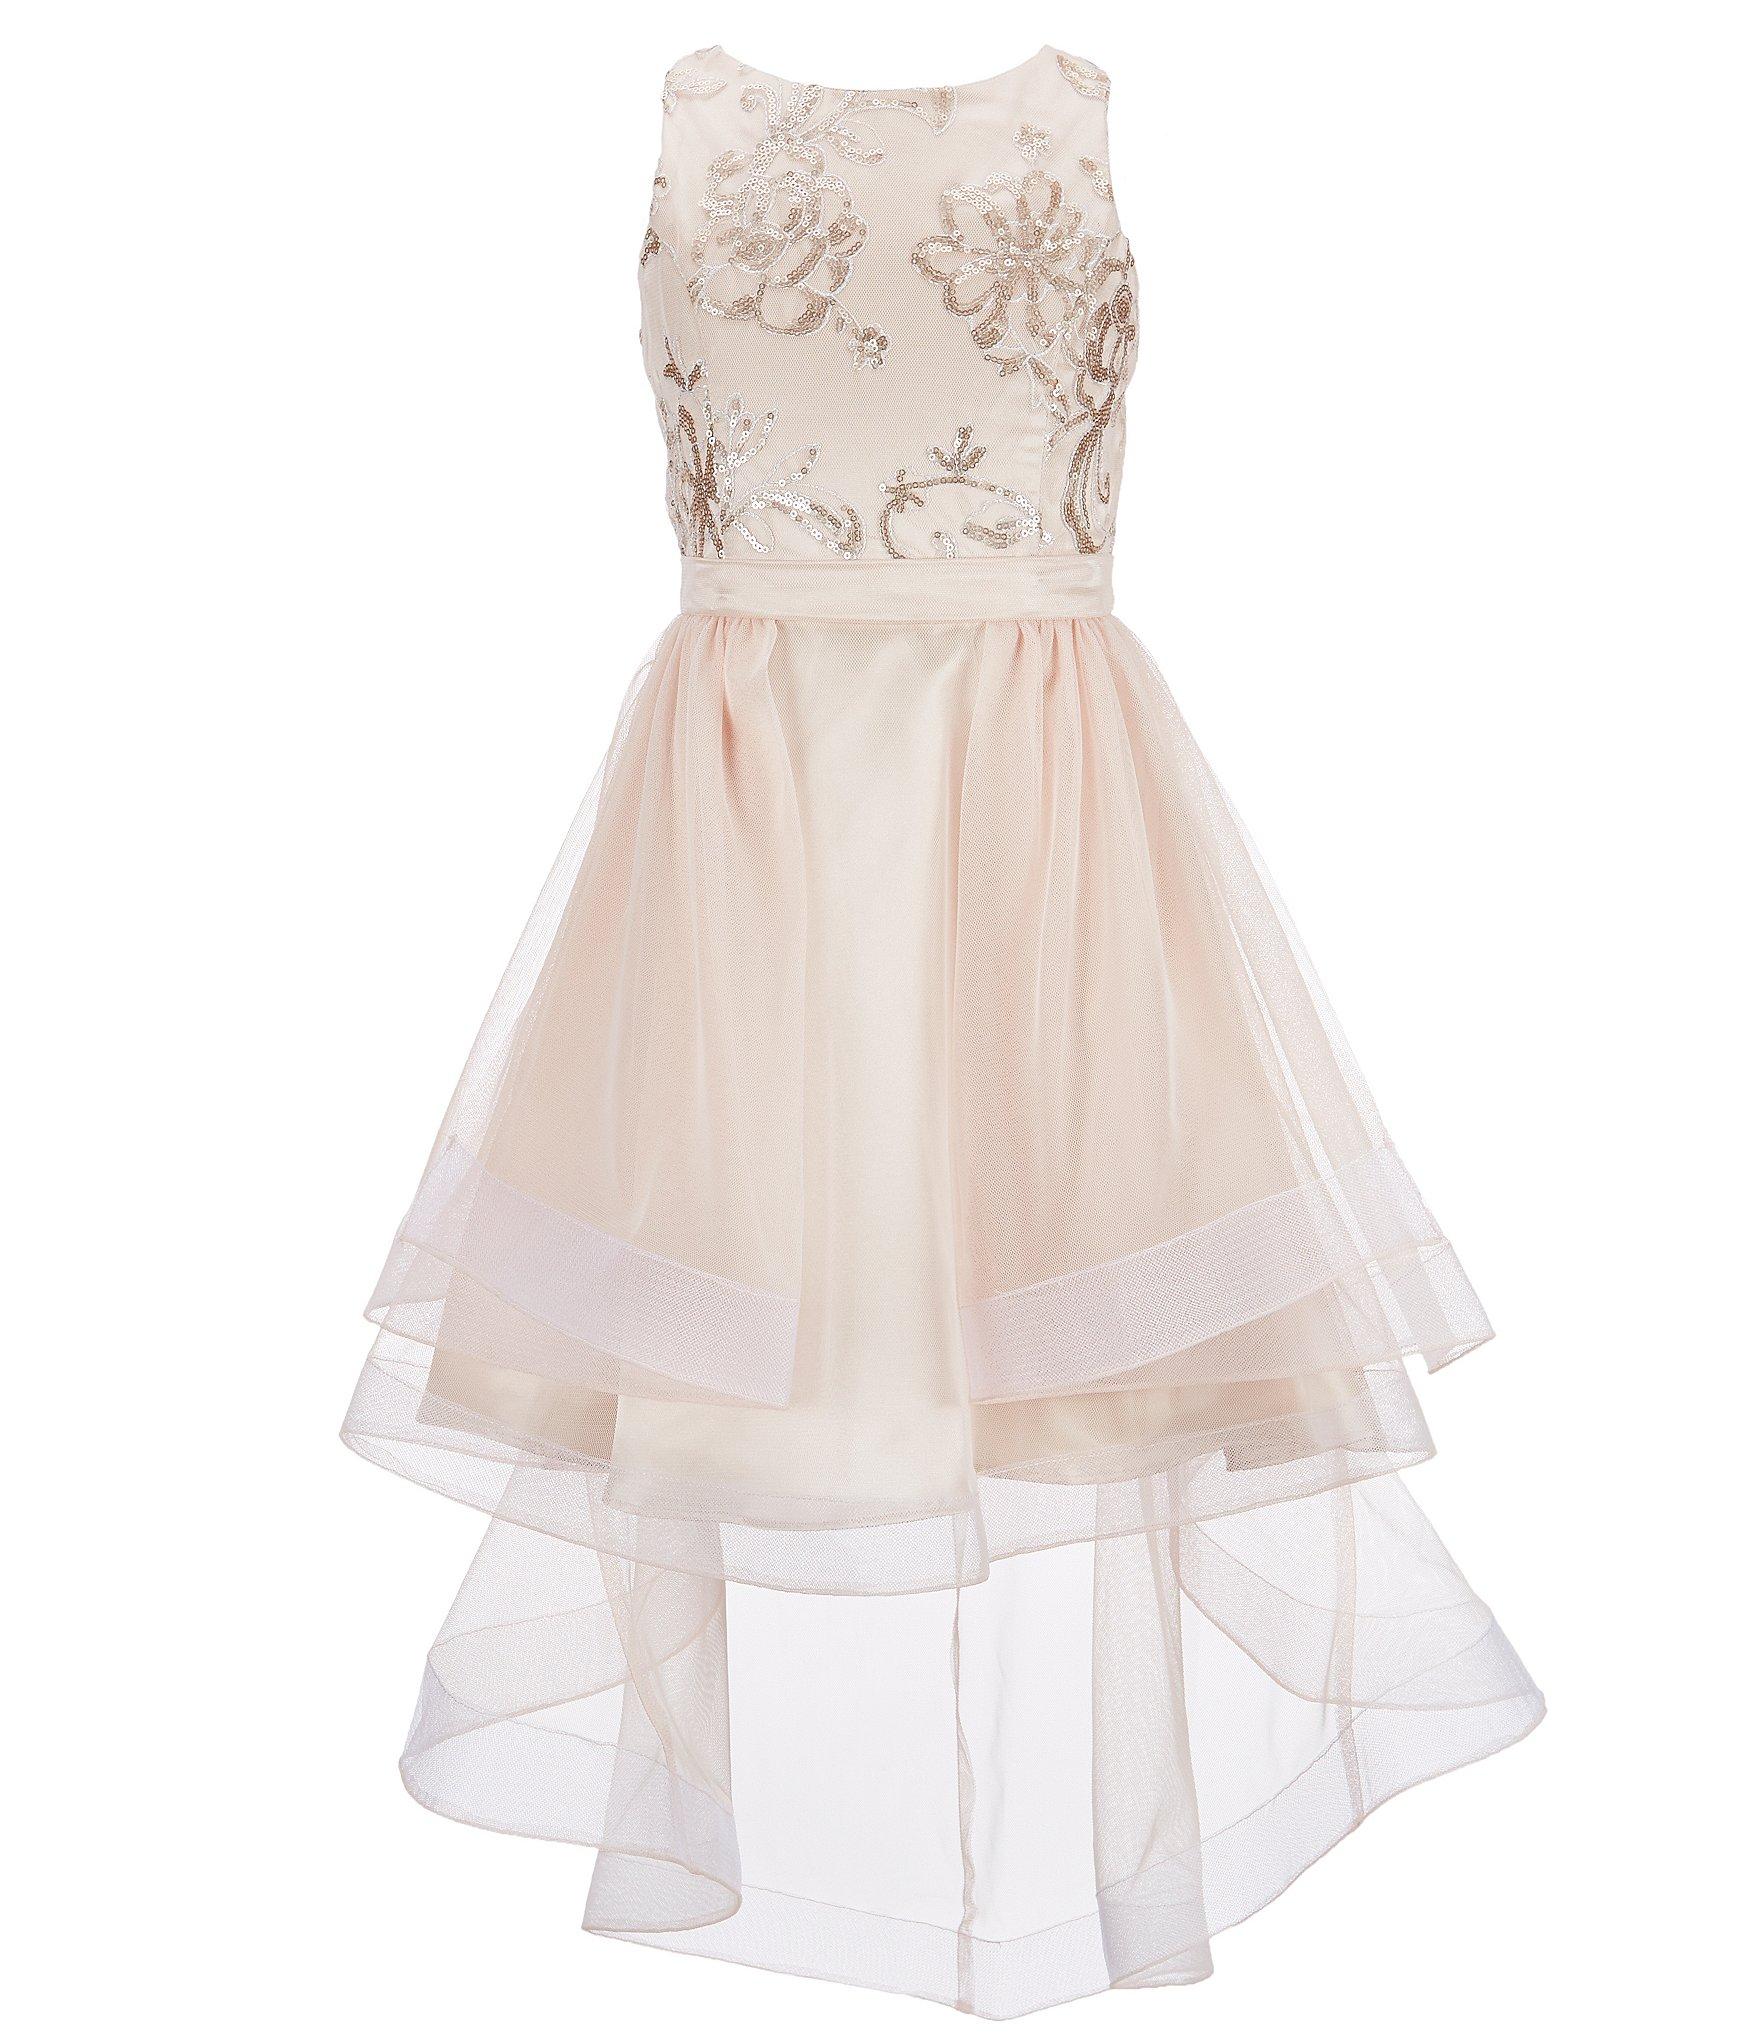 Kids | Girls | Dresses | Special Occasion Dresses | Big Girls' (7 ...